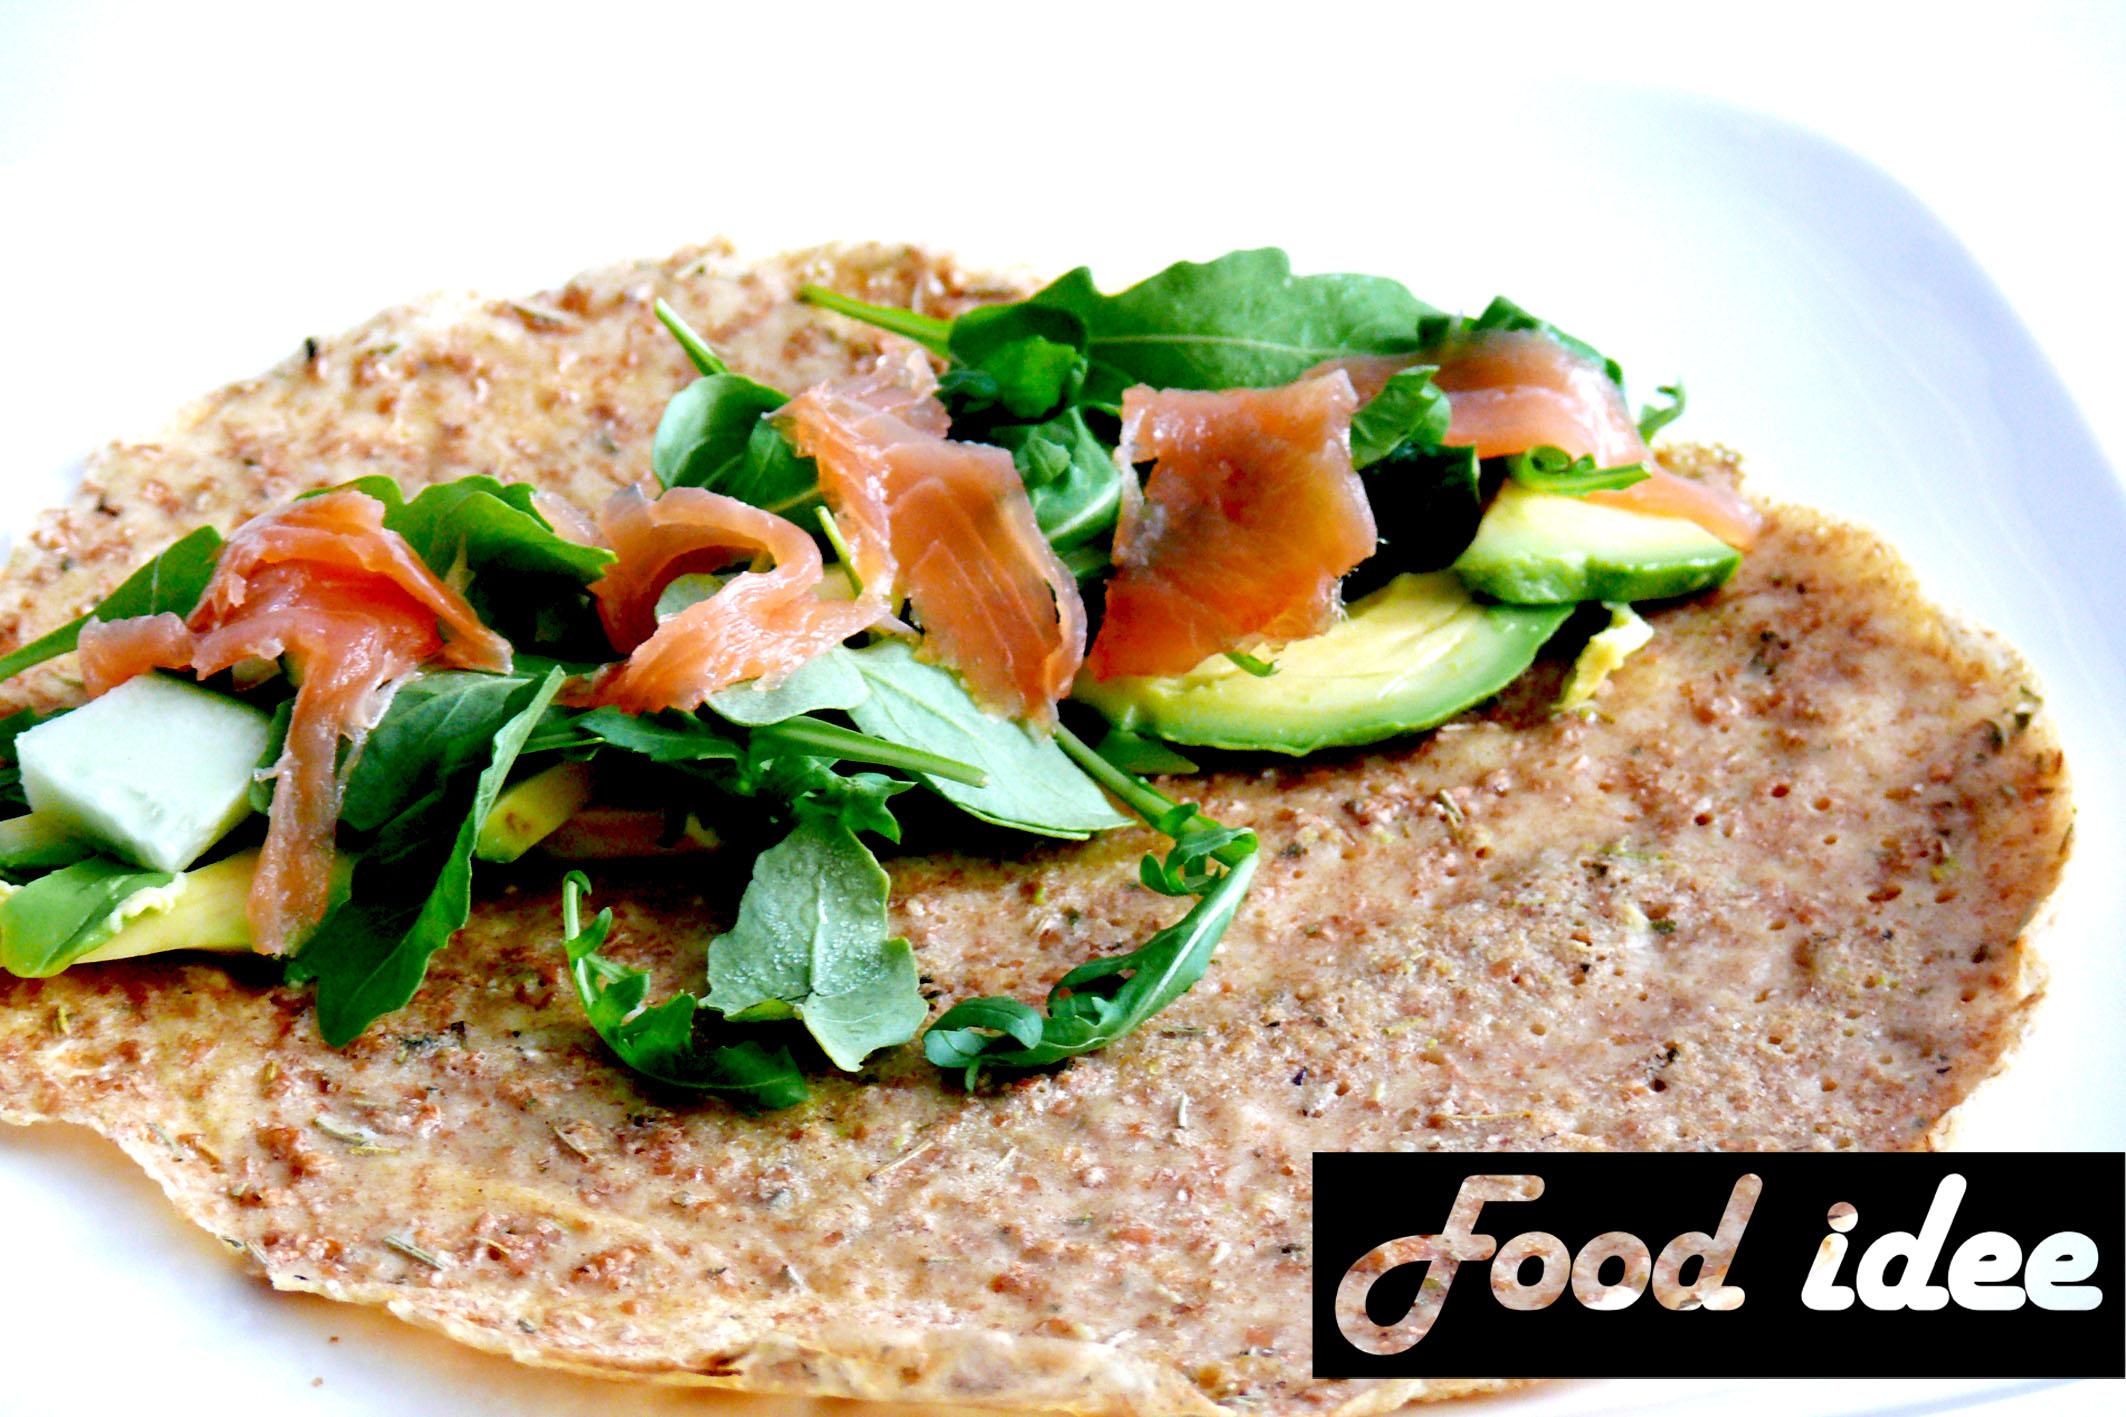 spelt boekweit pannenkoek met zalm en avocado